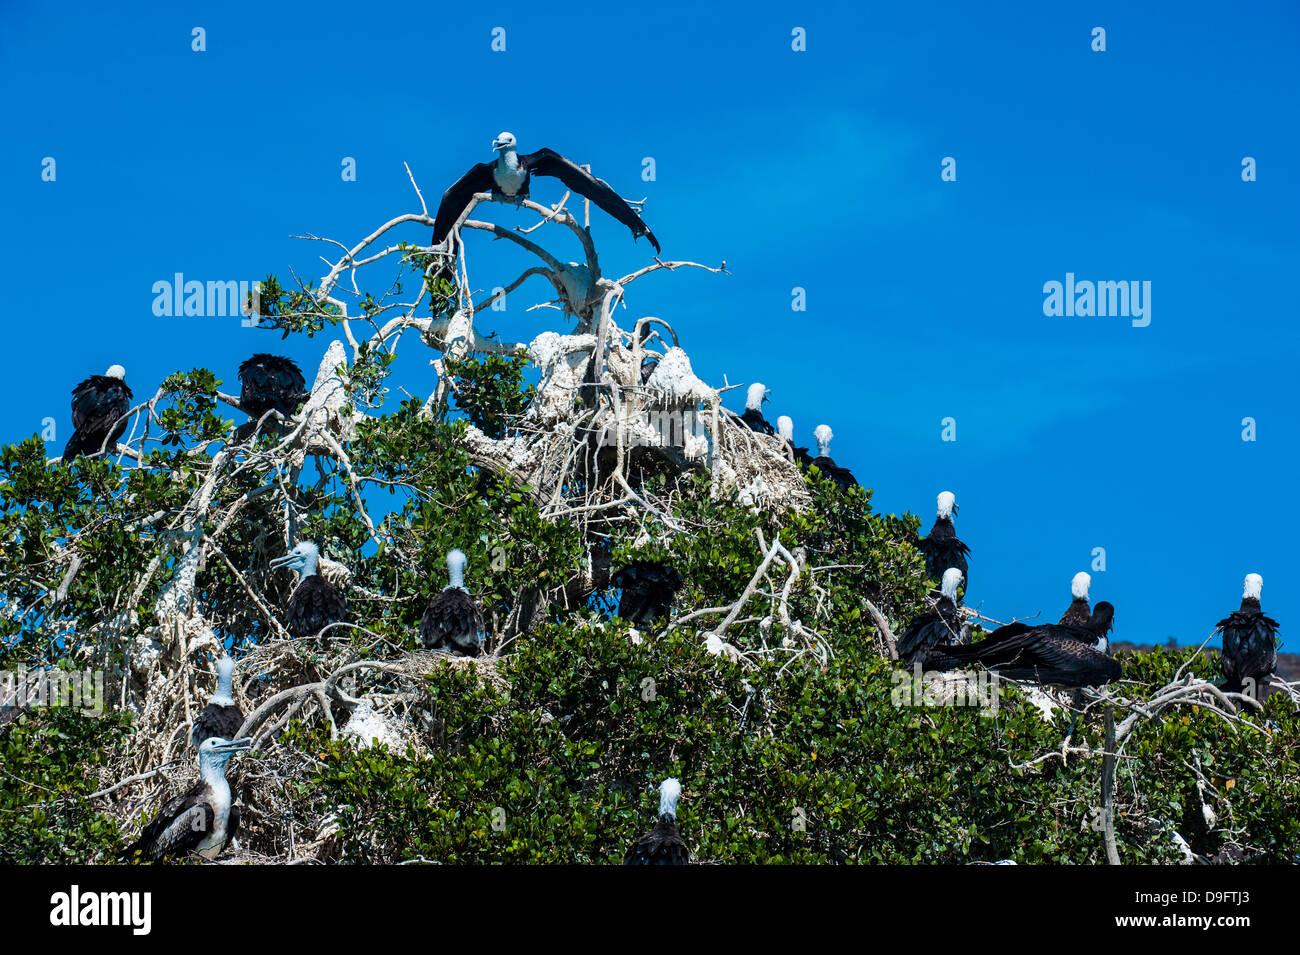 Frigate birds colony at Isla Espiritu Santo, Baja California, Mexico - Stock Image